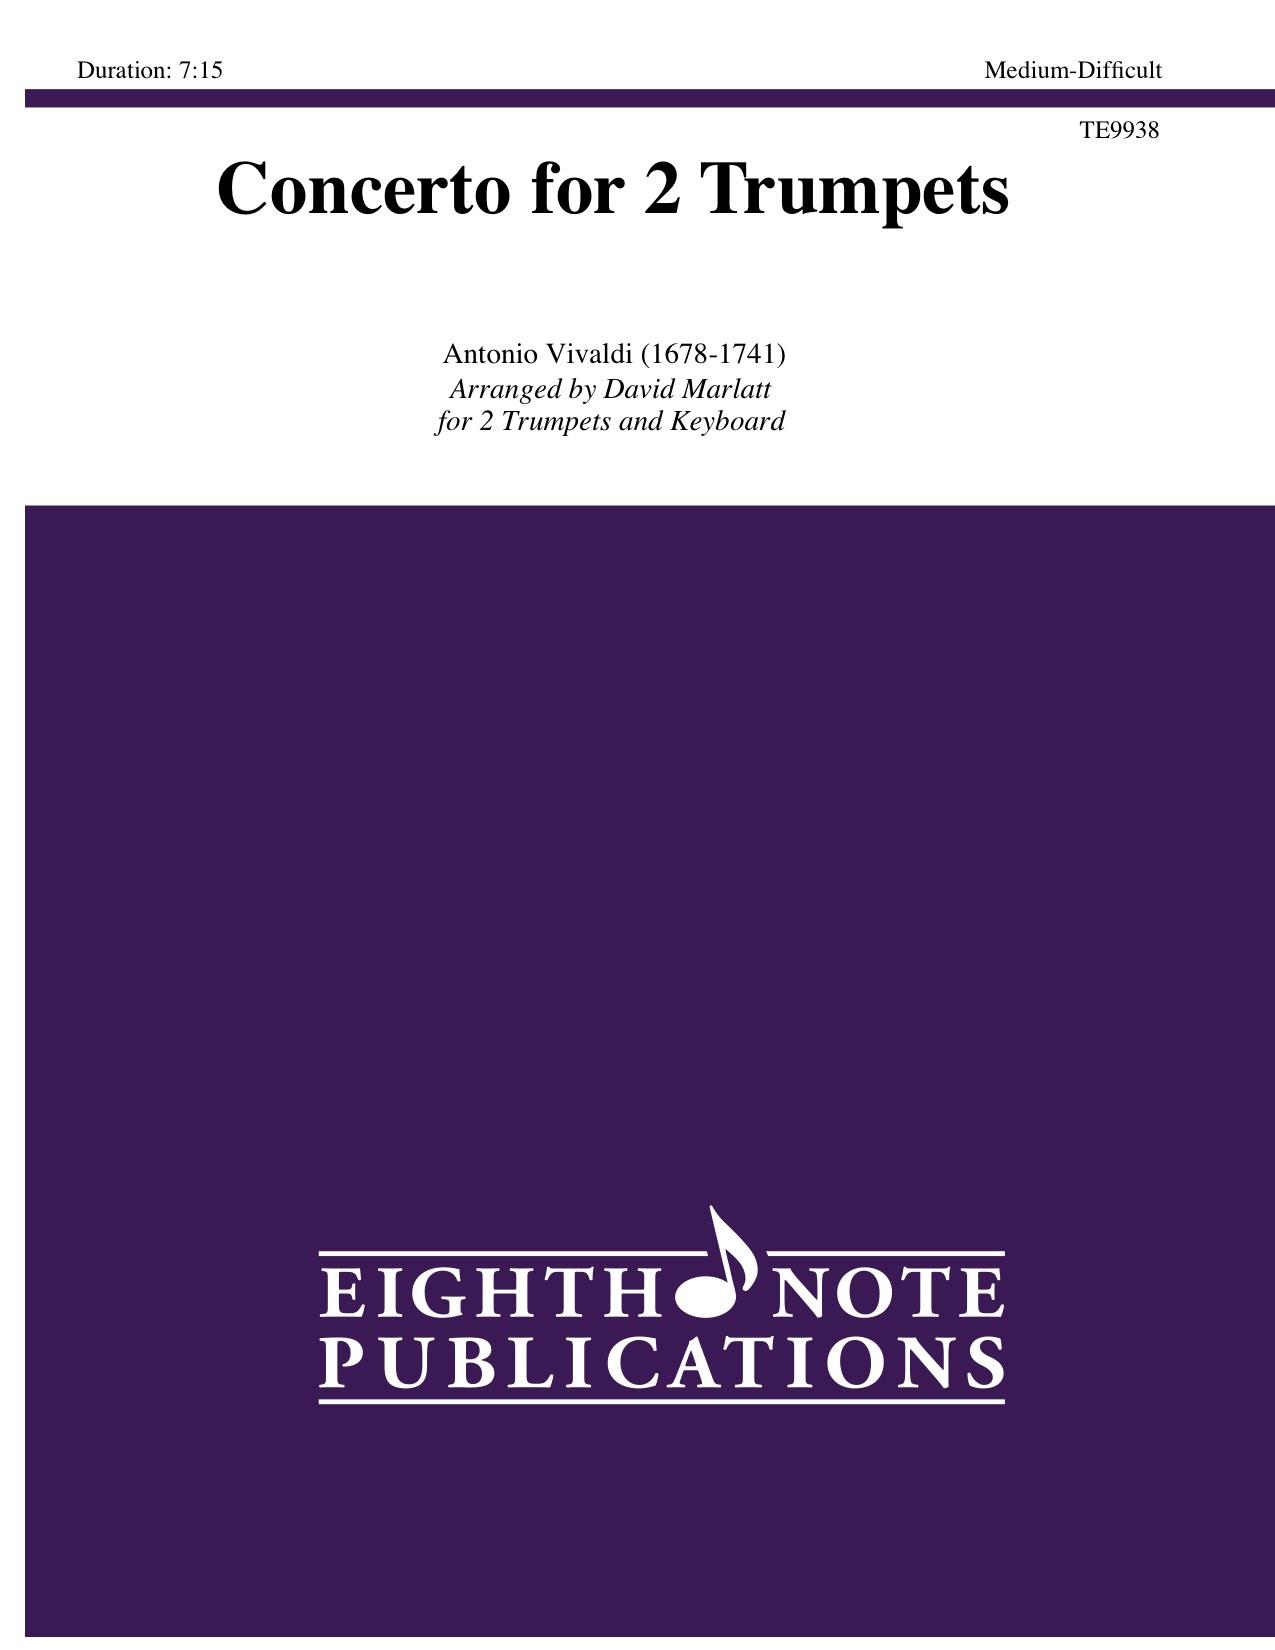 Concerto for 2 Trumpets  - Antonio Vivaldi